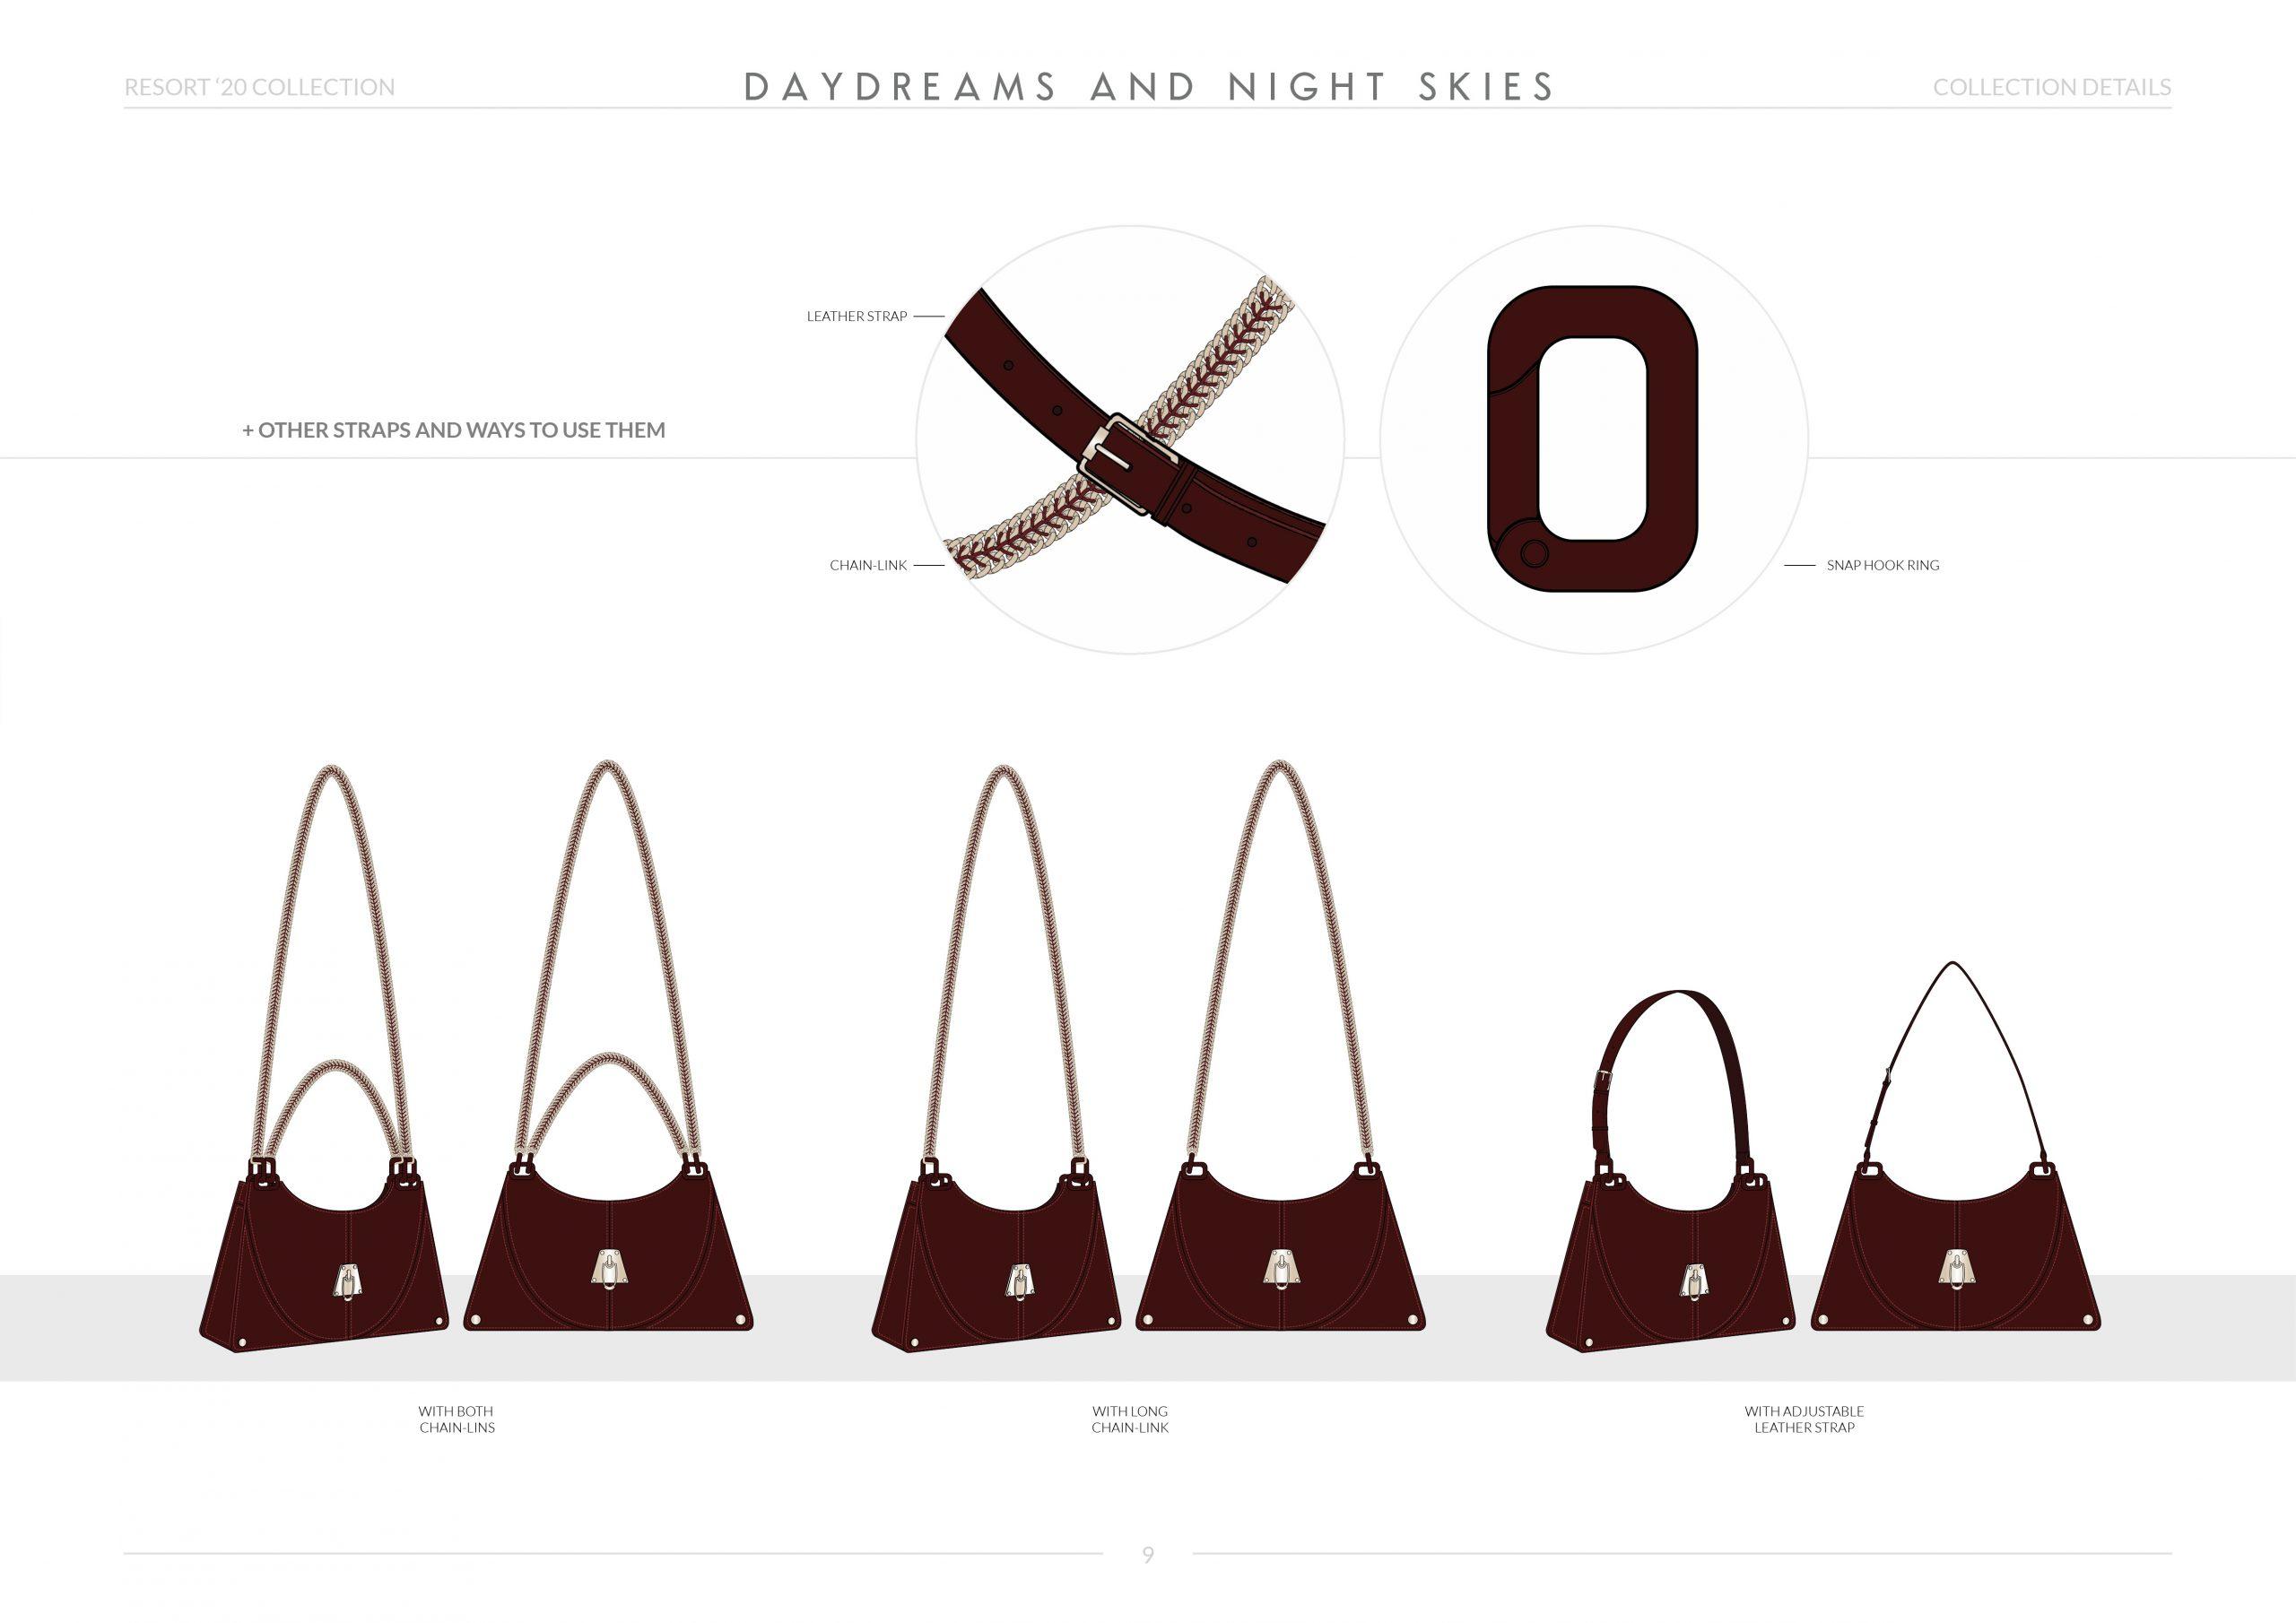 Resort-20 Womens Handbag Collection Details: Style 3